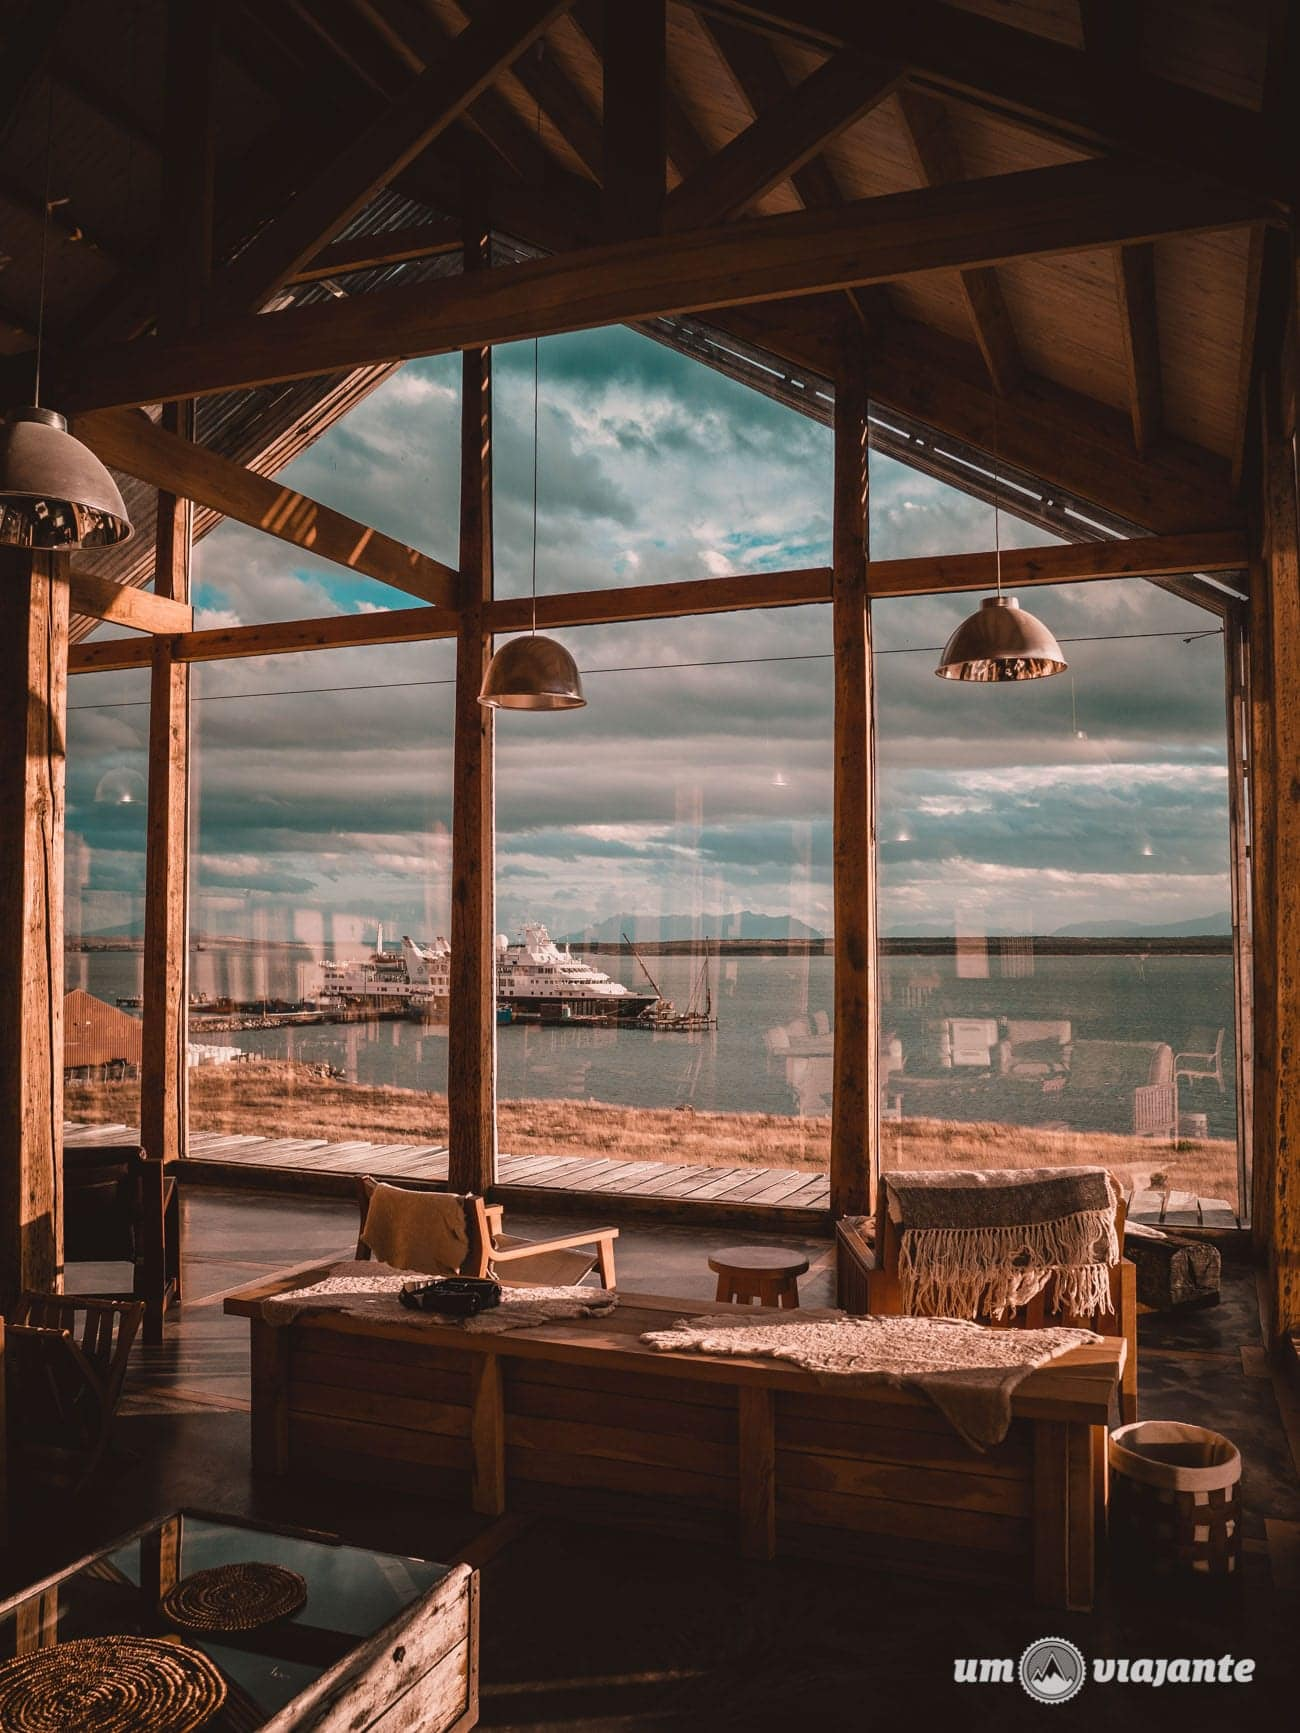 Simple Patagonia, Hotel em Puerto Natales - Chile